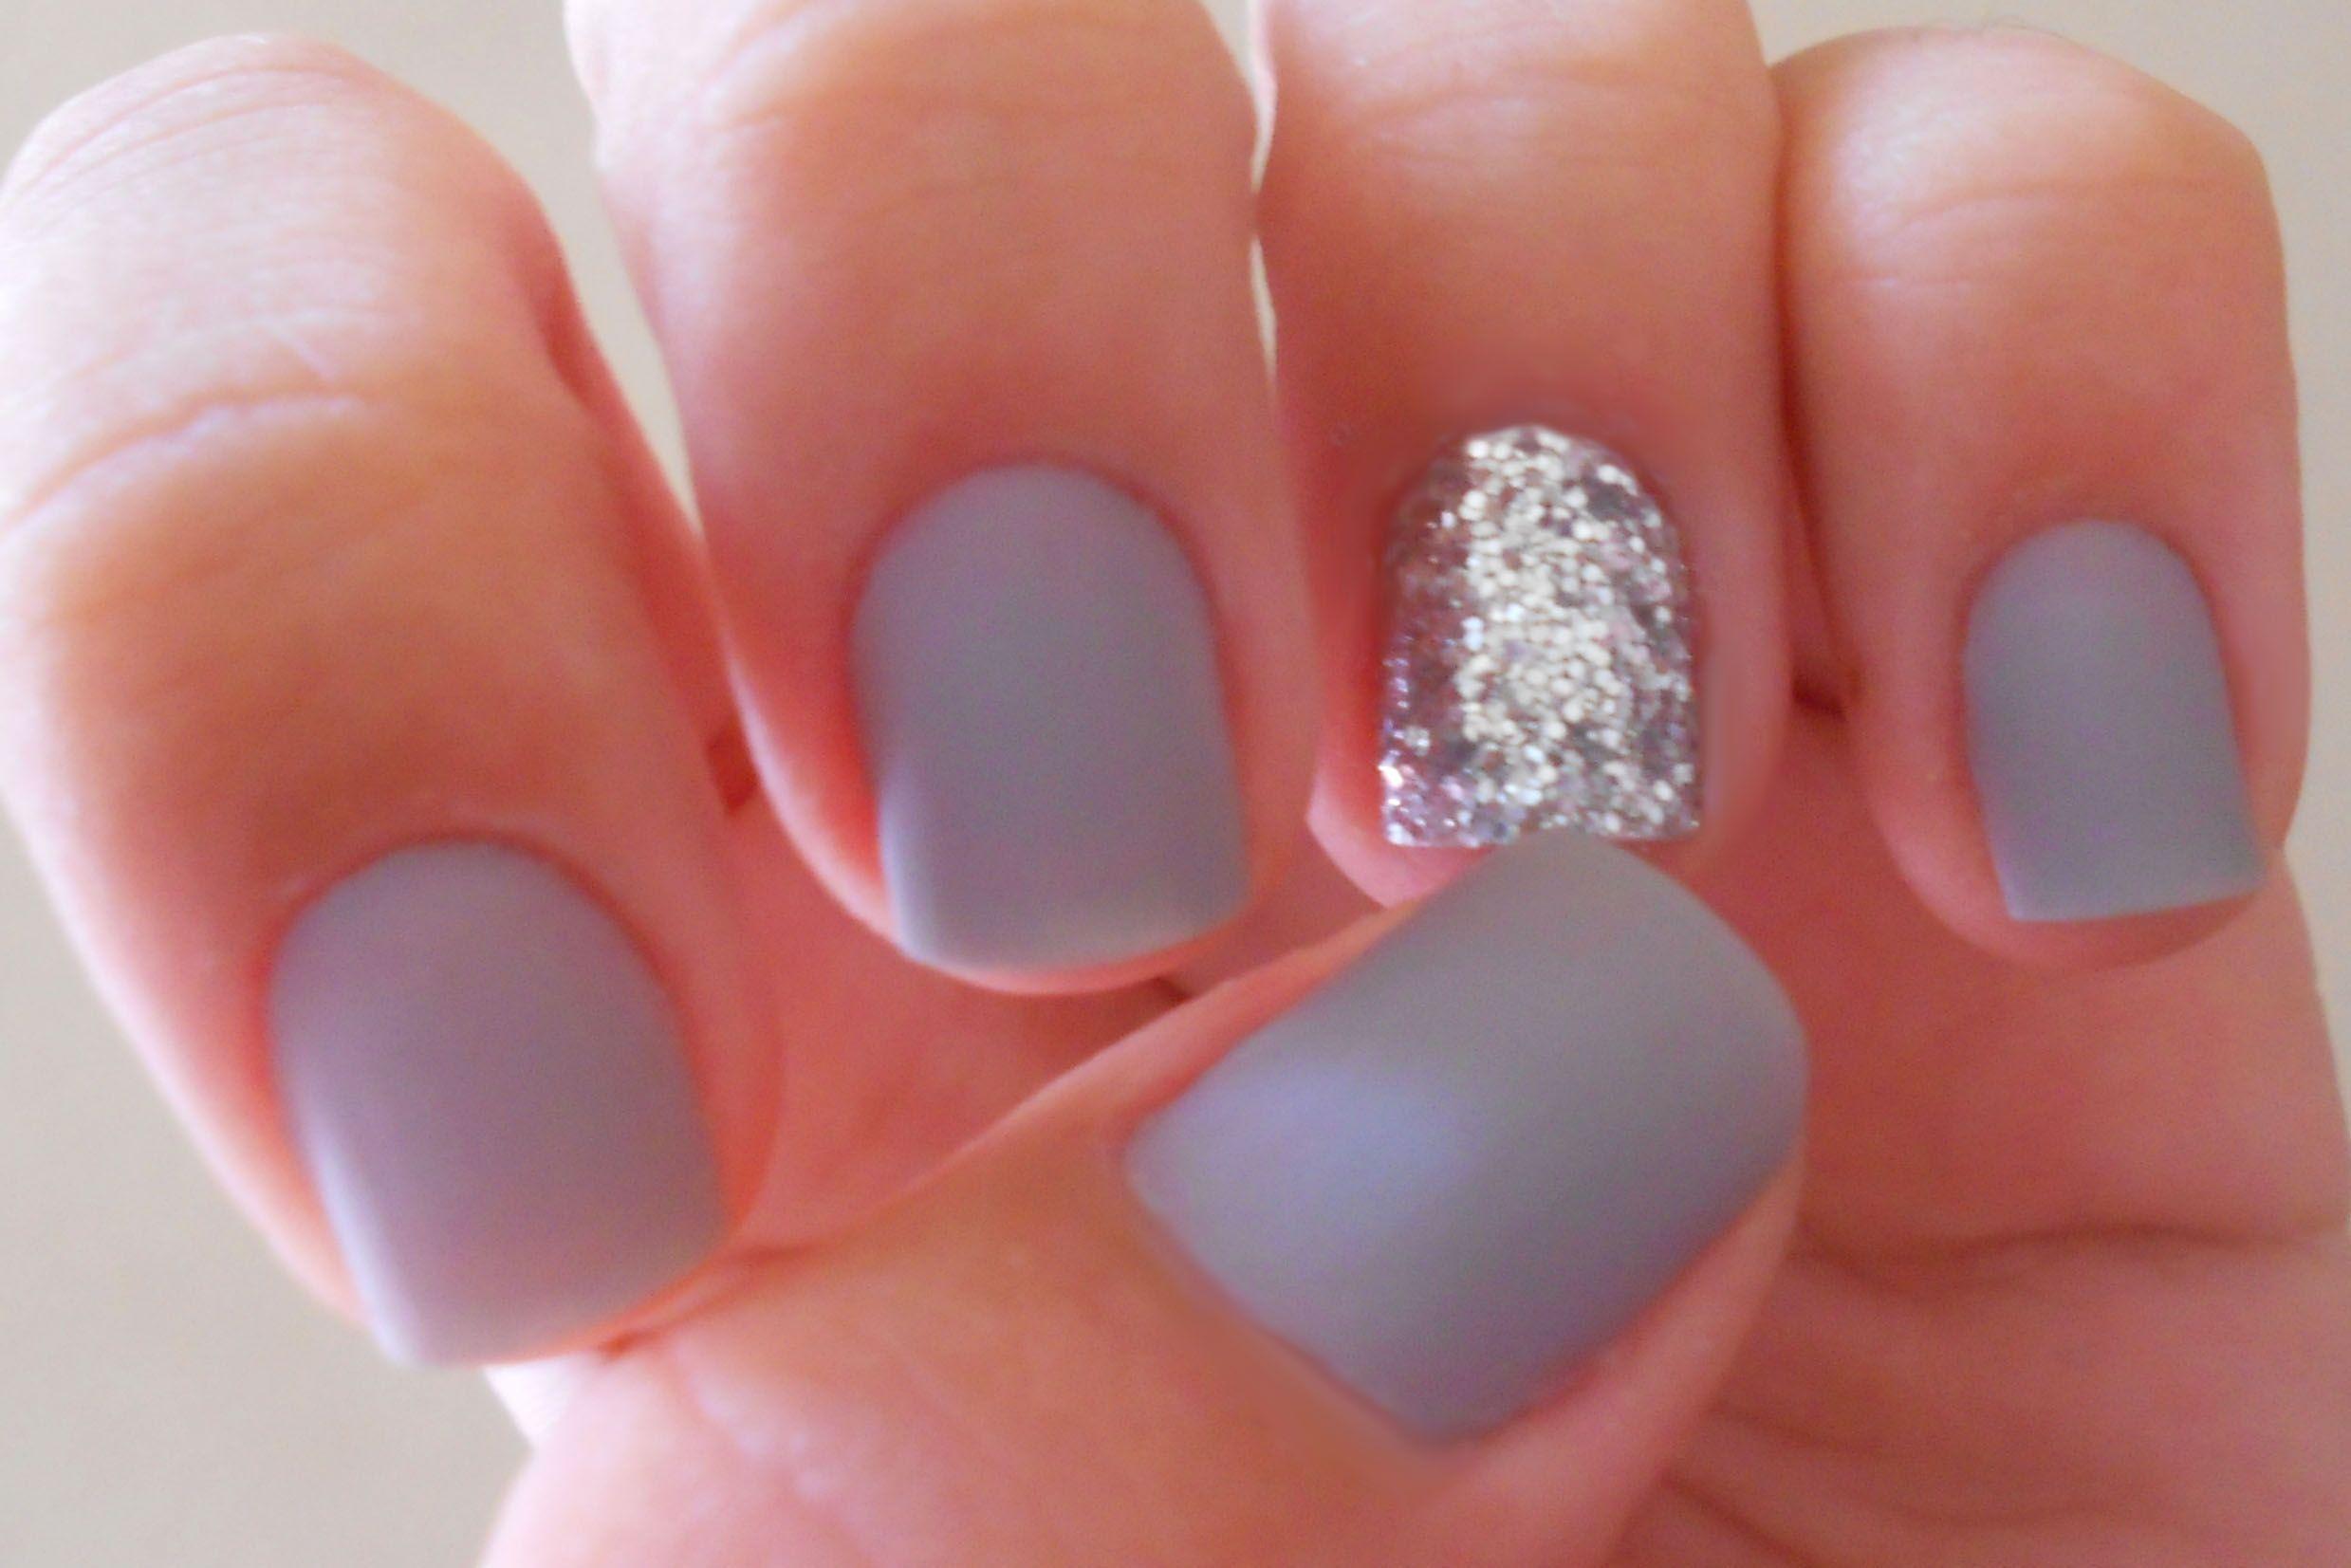 Gray matte + glitter nails :)>>>>to get matt polish add cornstarch ...